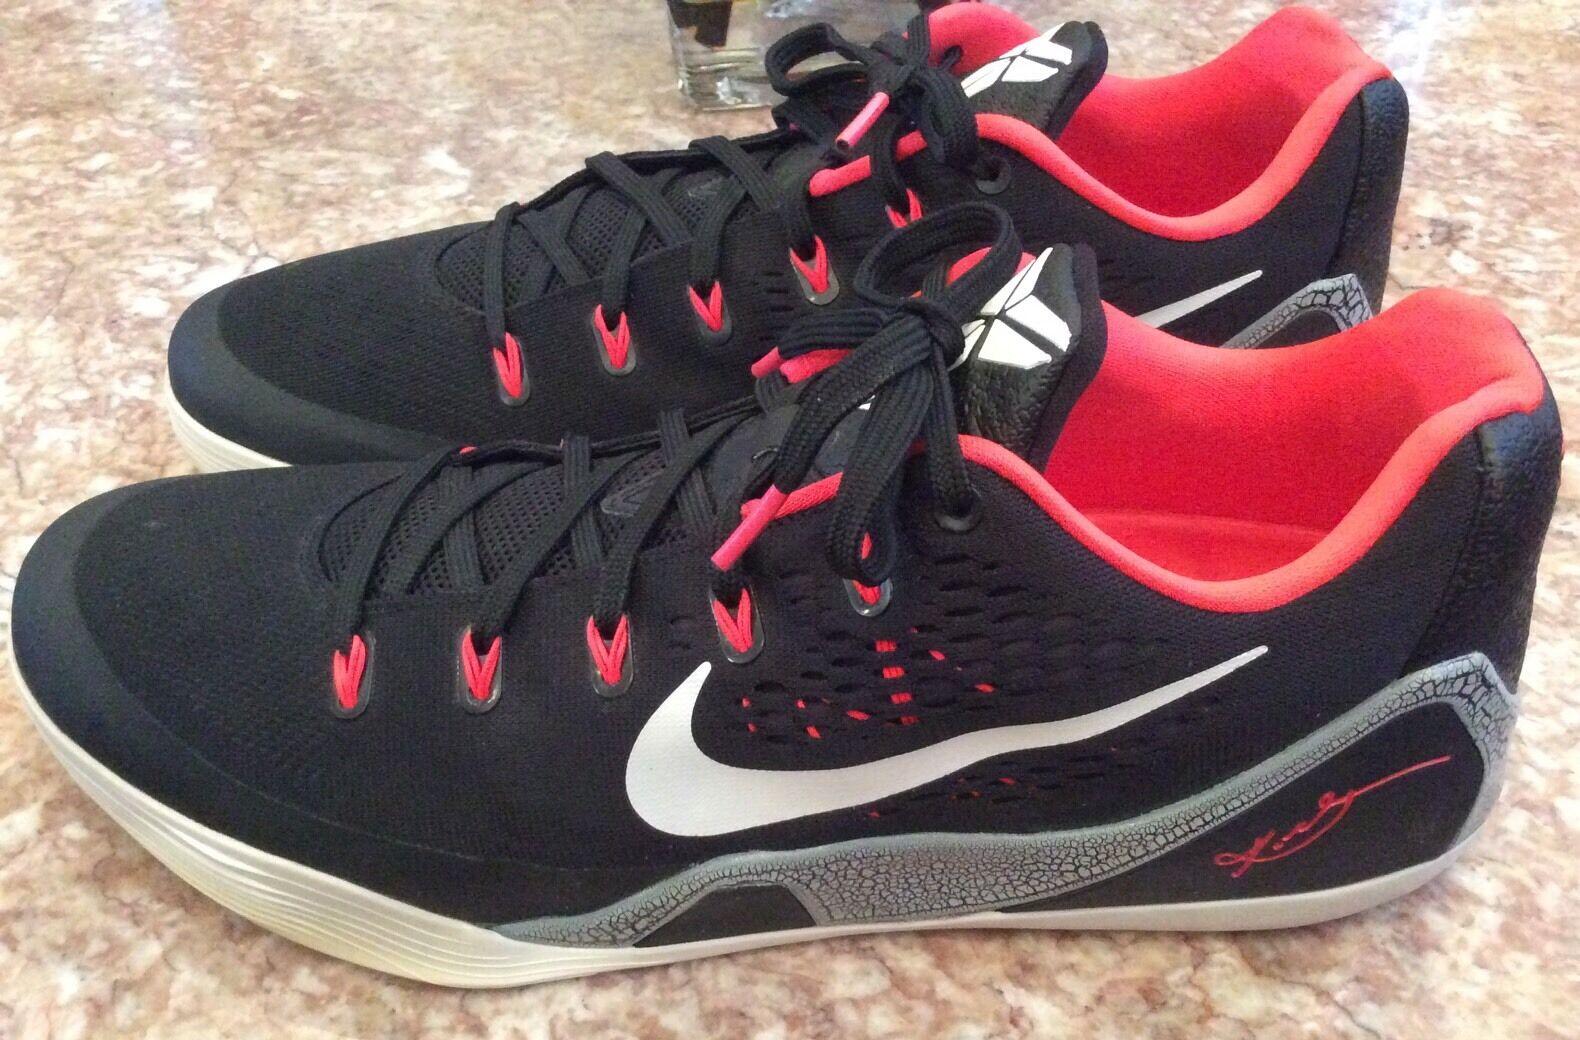 Nike Kobe 9 IX Low EM Black White Laser Crimson Cement XI Size 14, 646701-001